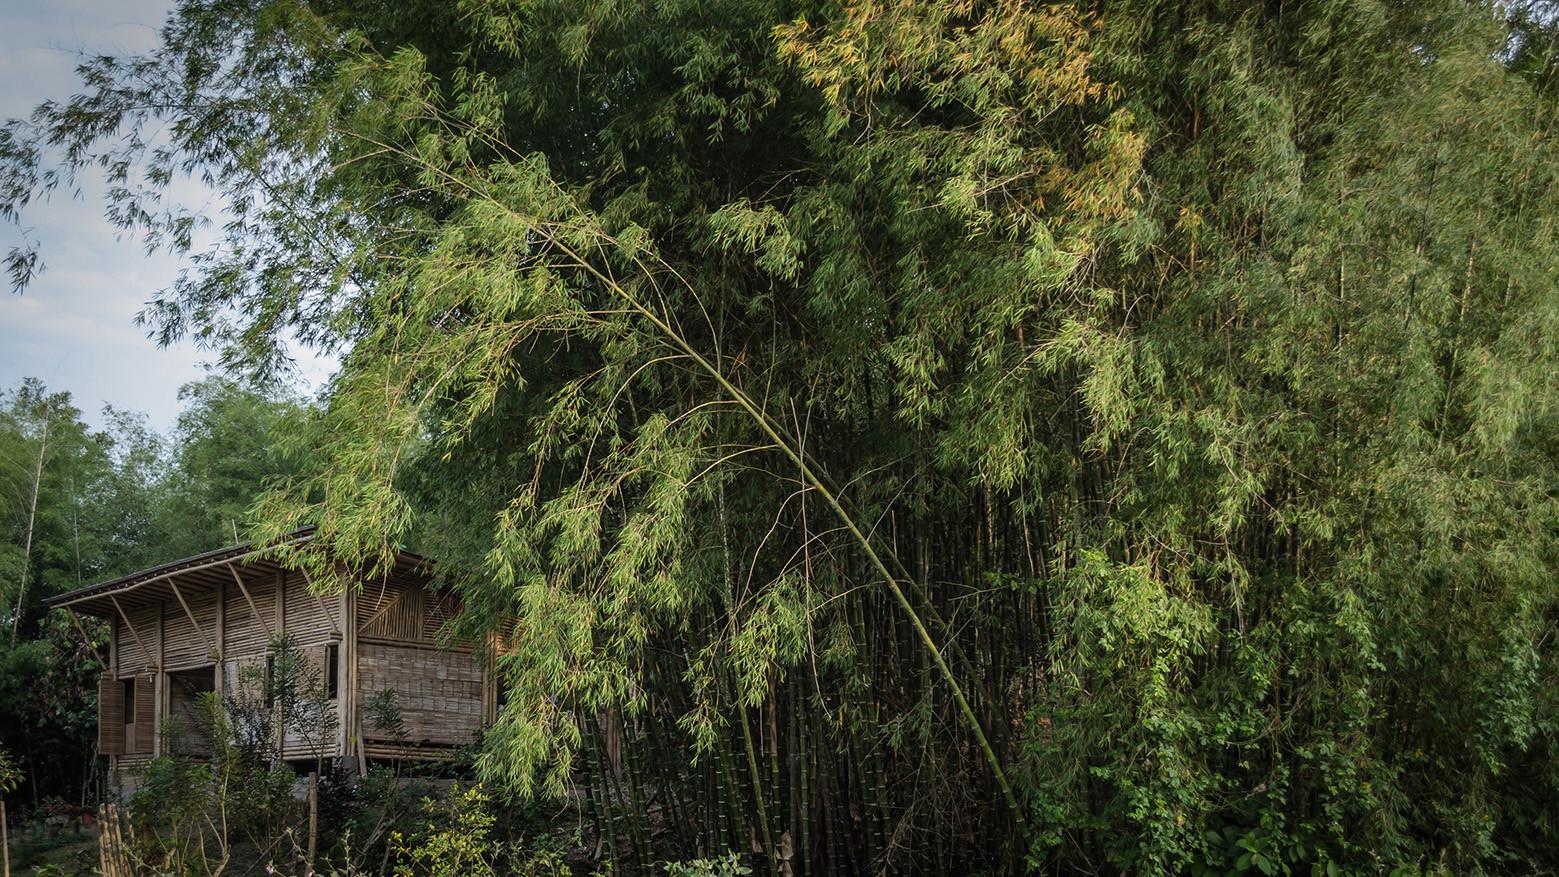 Galer a de casa convento enrique mora alvarado 7 for Casa con piscina quebrada alvarado